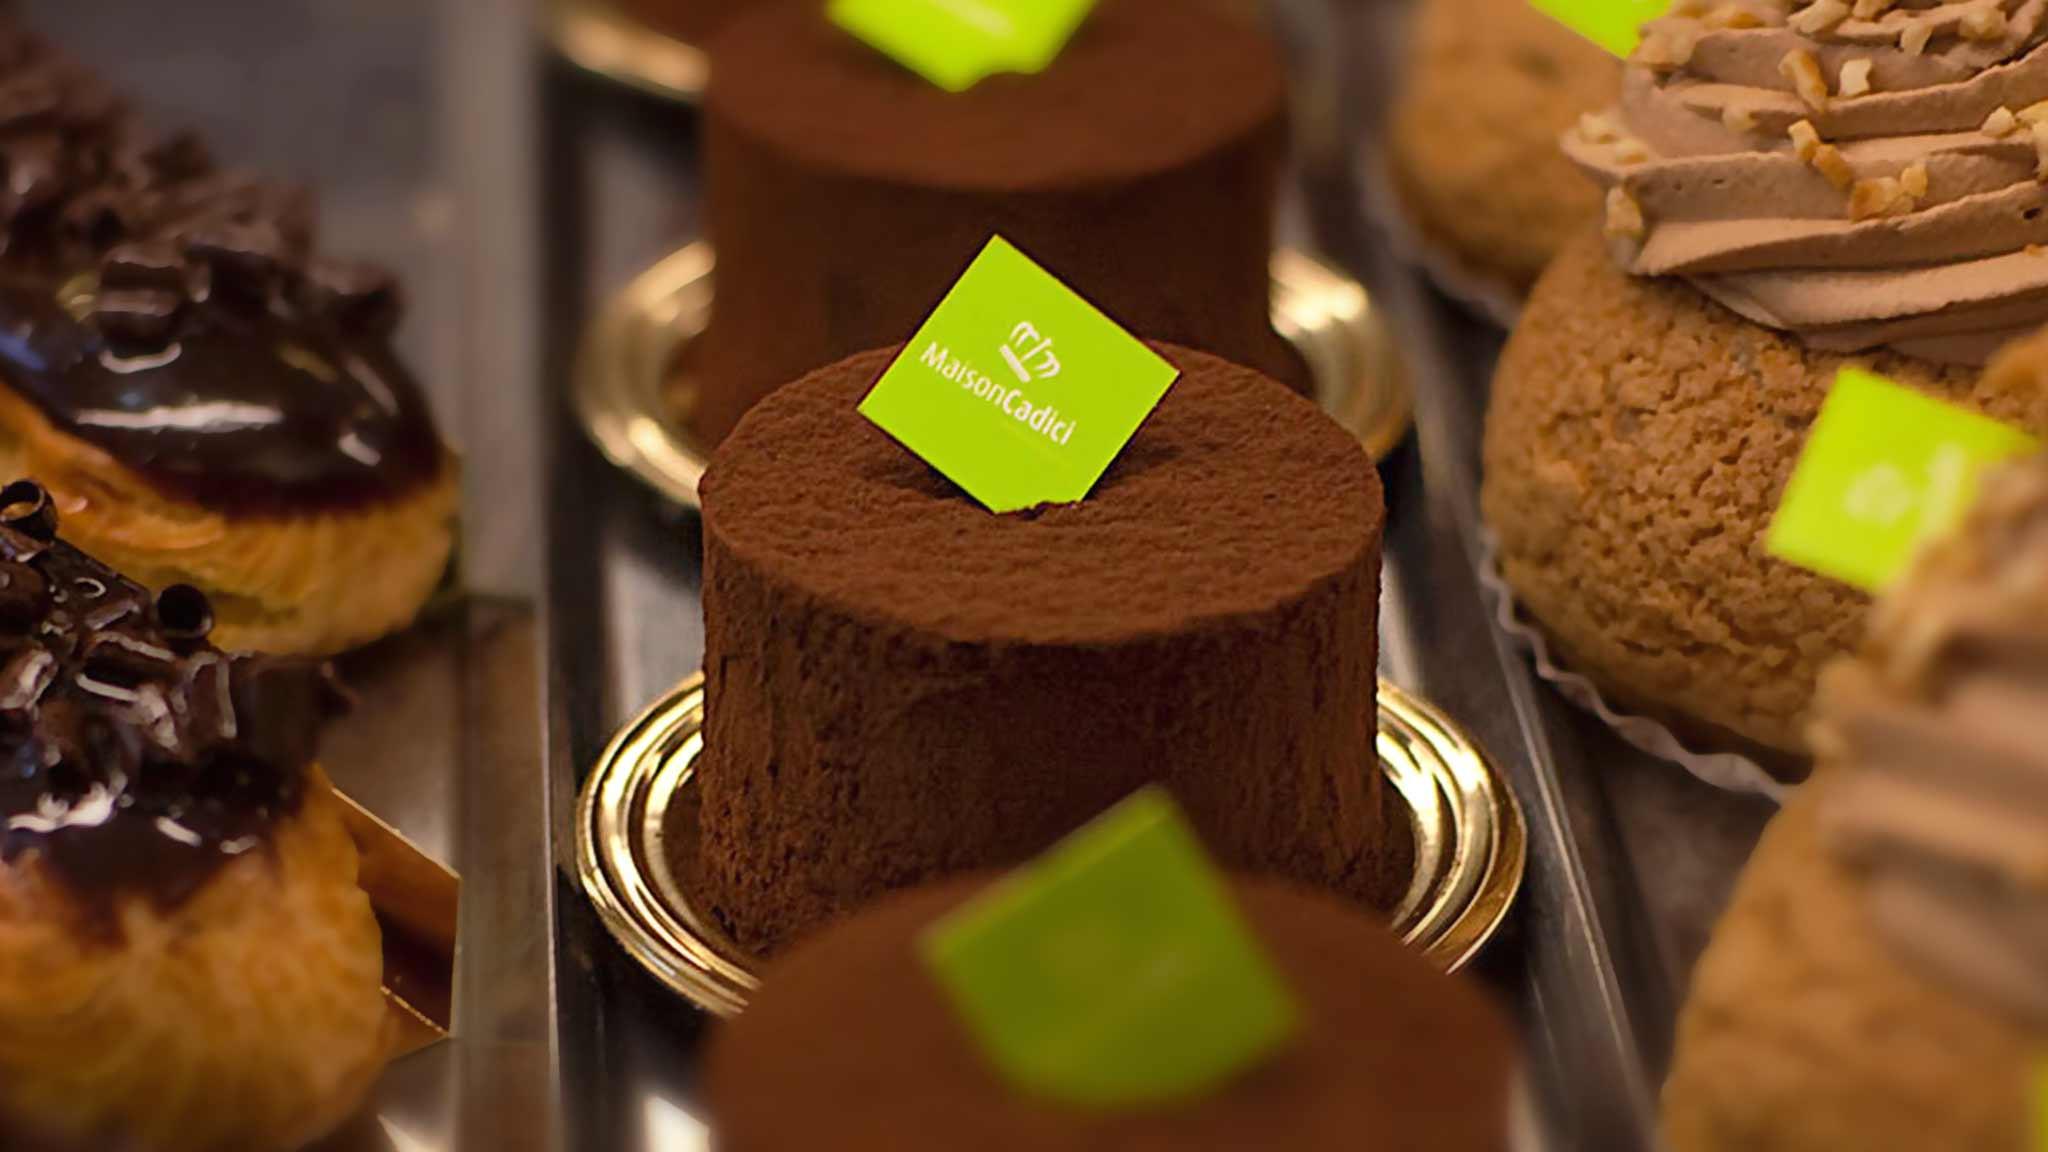 photographe-produit-photo-culinaire-dessert-patisserie-chocolat-gentle-studio-nancy-lorraine-54-photo-produit-cacao-cadici